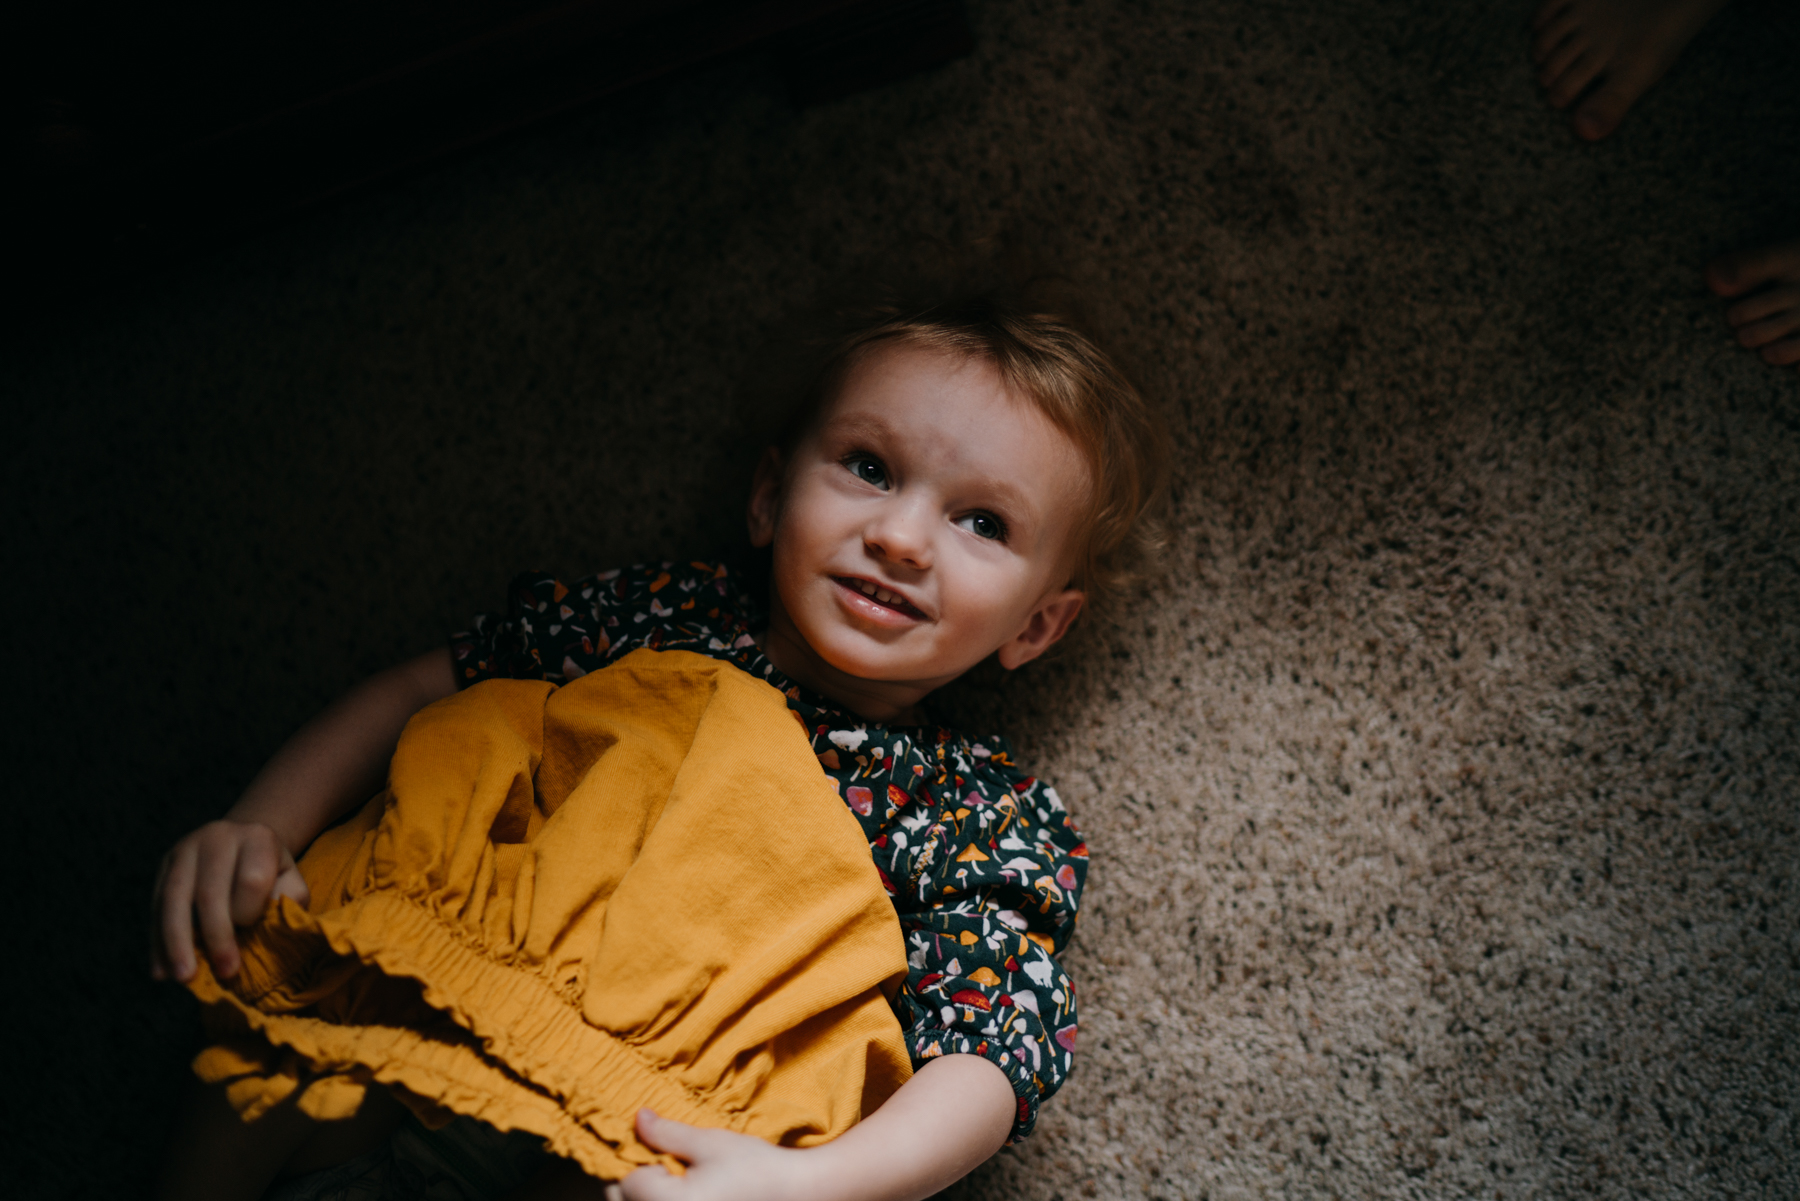 anchoragefamilyphotographer7.jpg